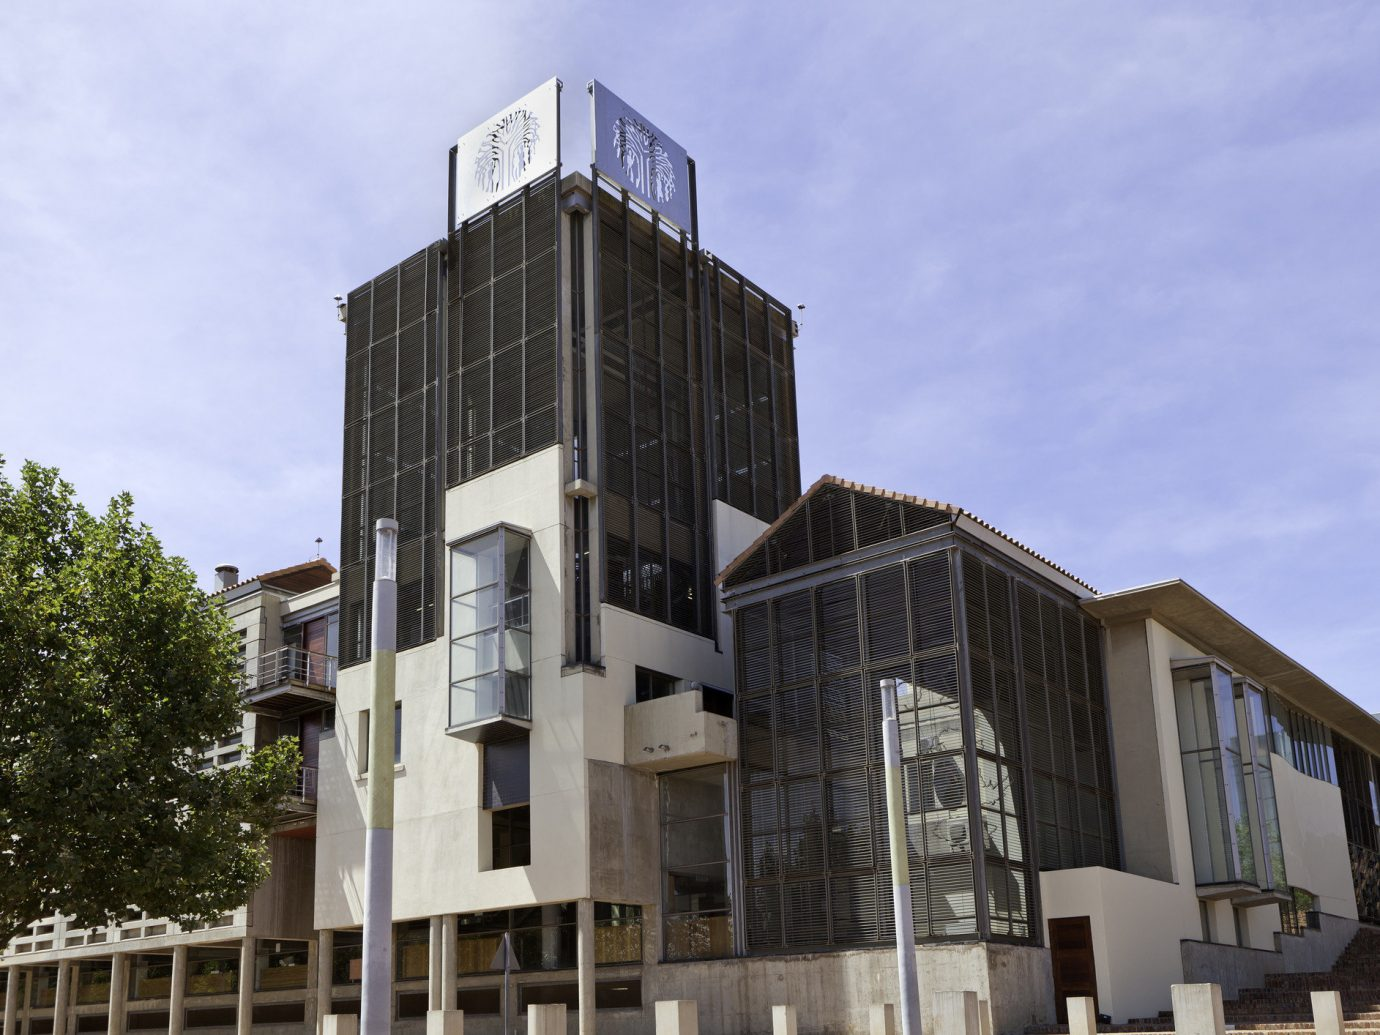 City Johannesburg South Africa Trip Ideas building Architecture mixed use facade condominium corporate headquarters brutalist architecture house commercial building headquarters apartment